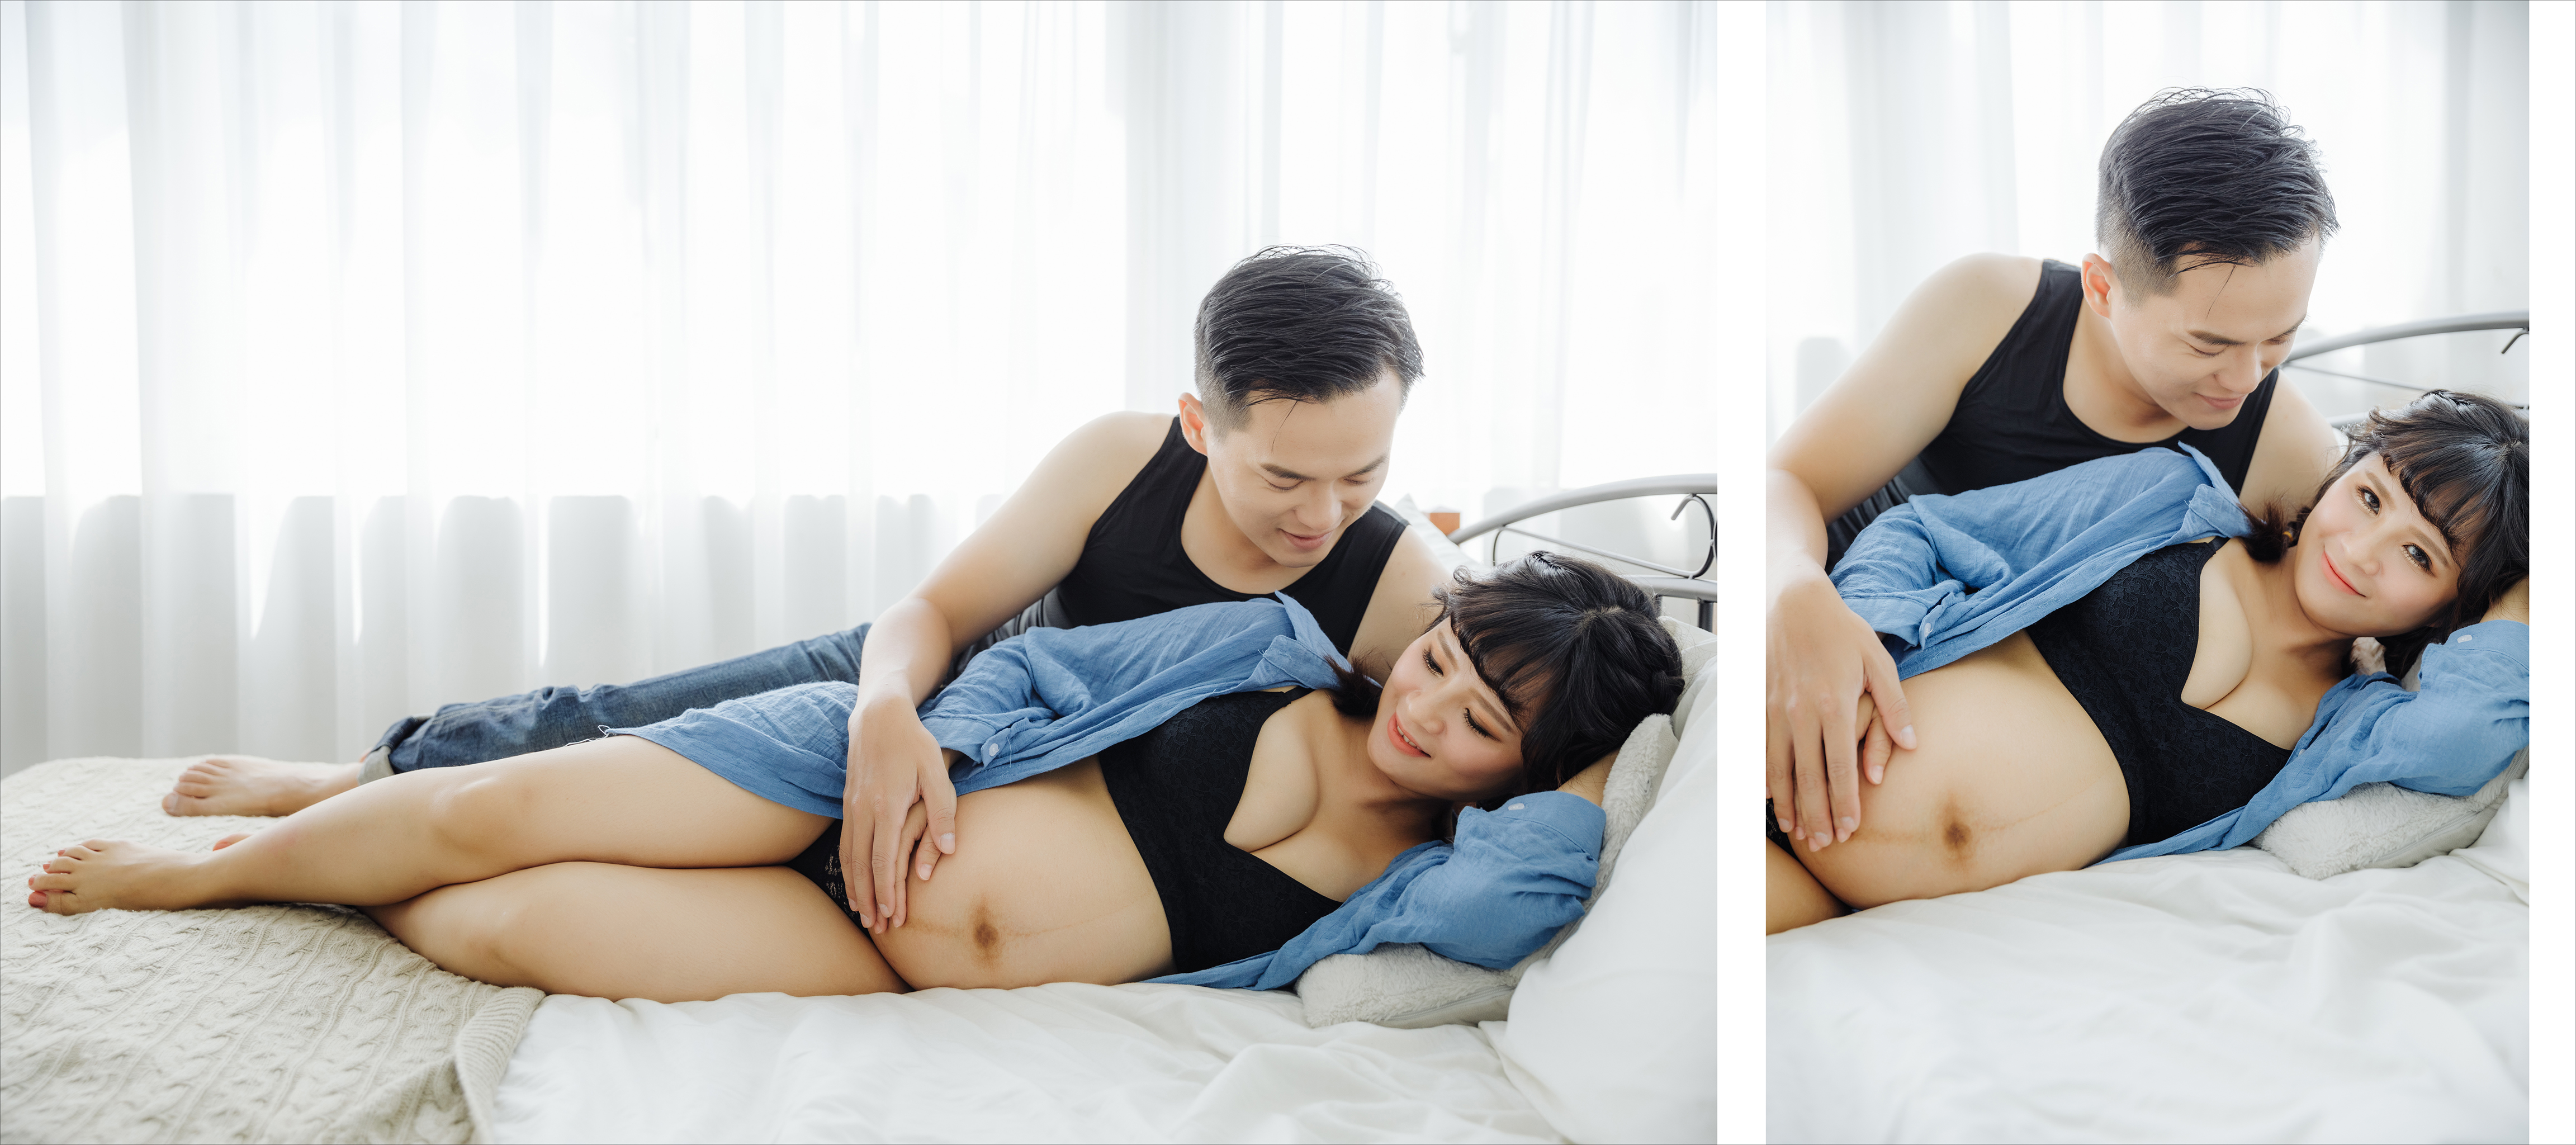 48973247311 0c734ebc94 o - 【孕婦寫真】+如蕙&至宏+